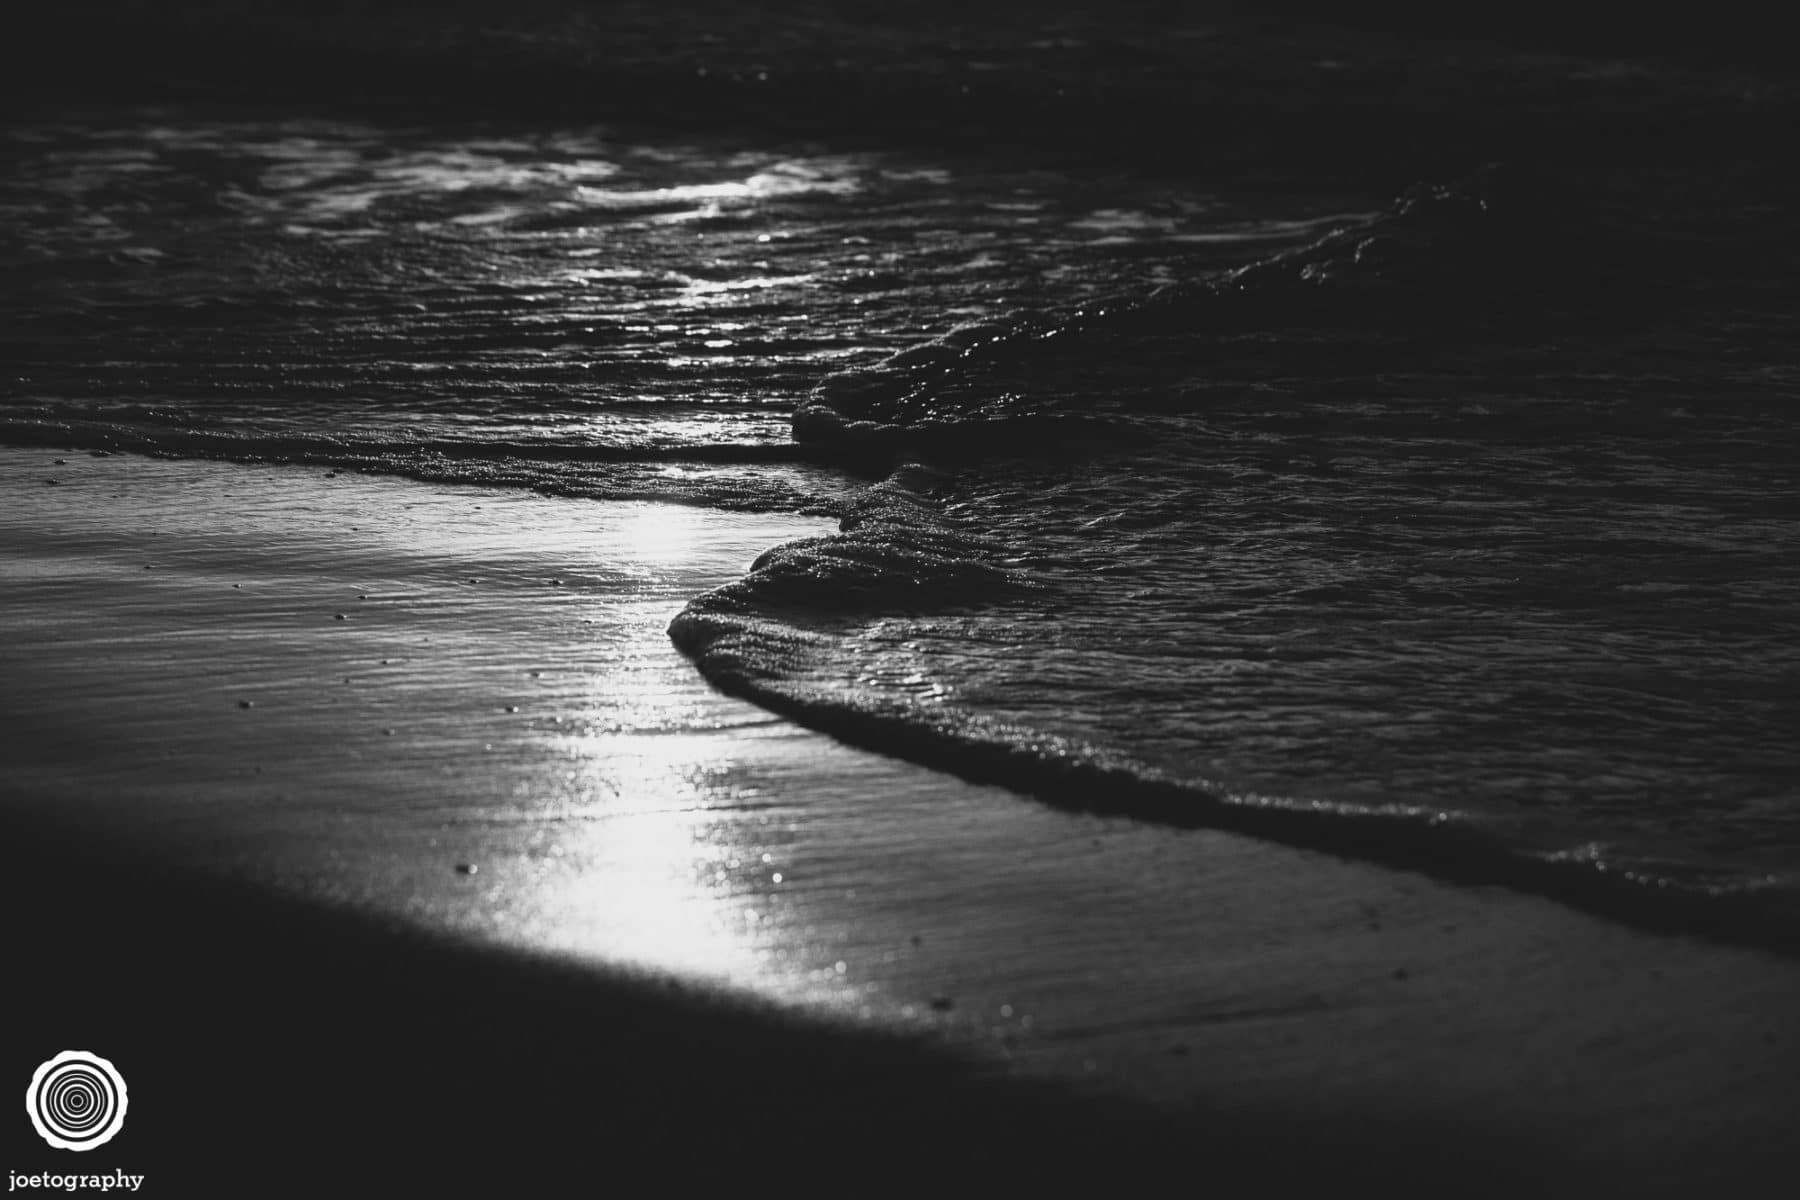 Outer-Banks-North-Carolina-Travel-Photography-32